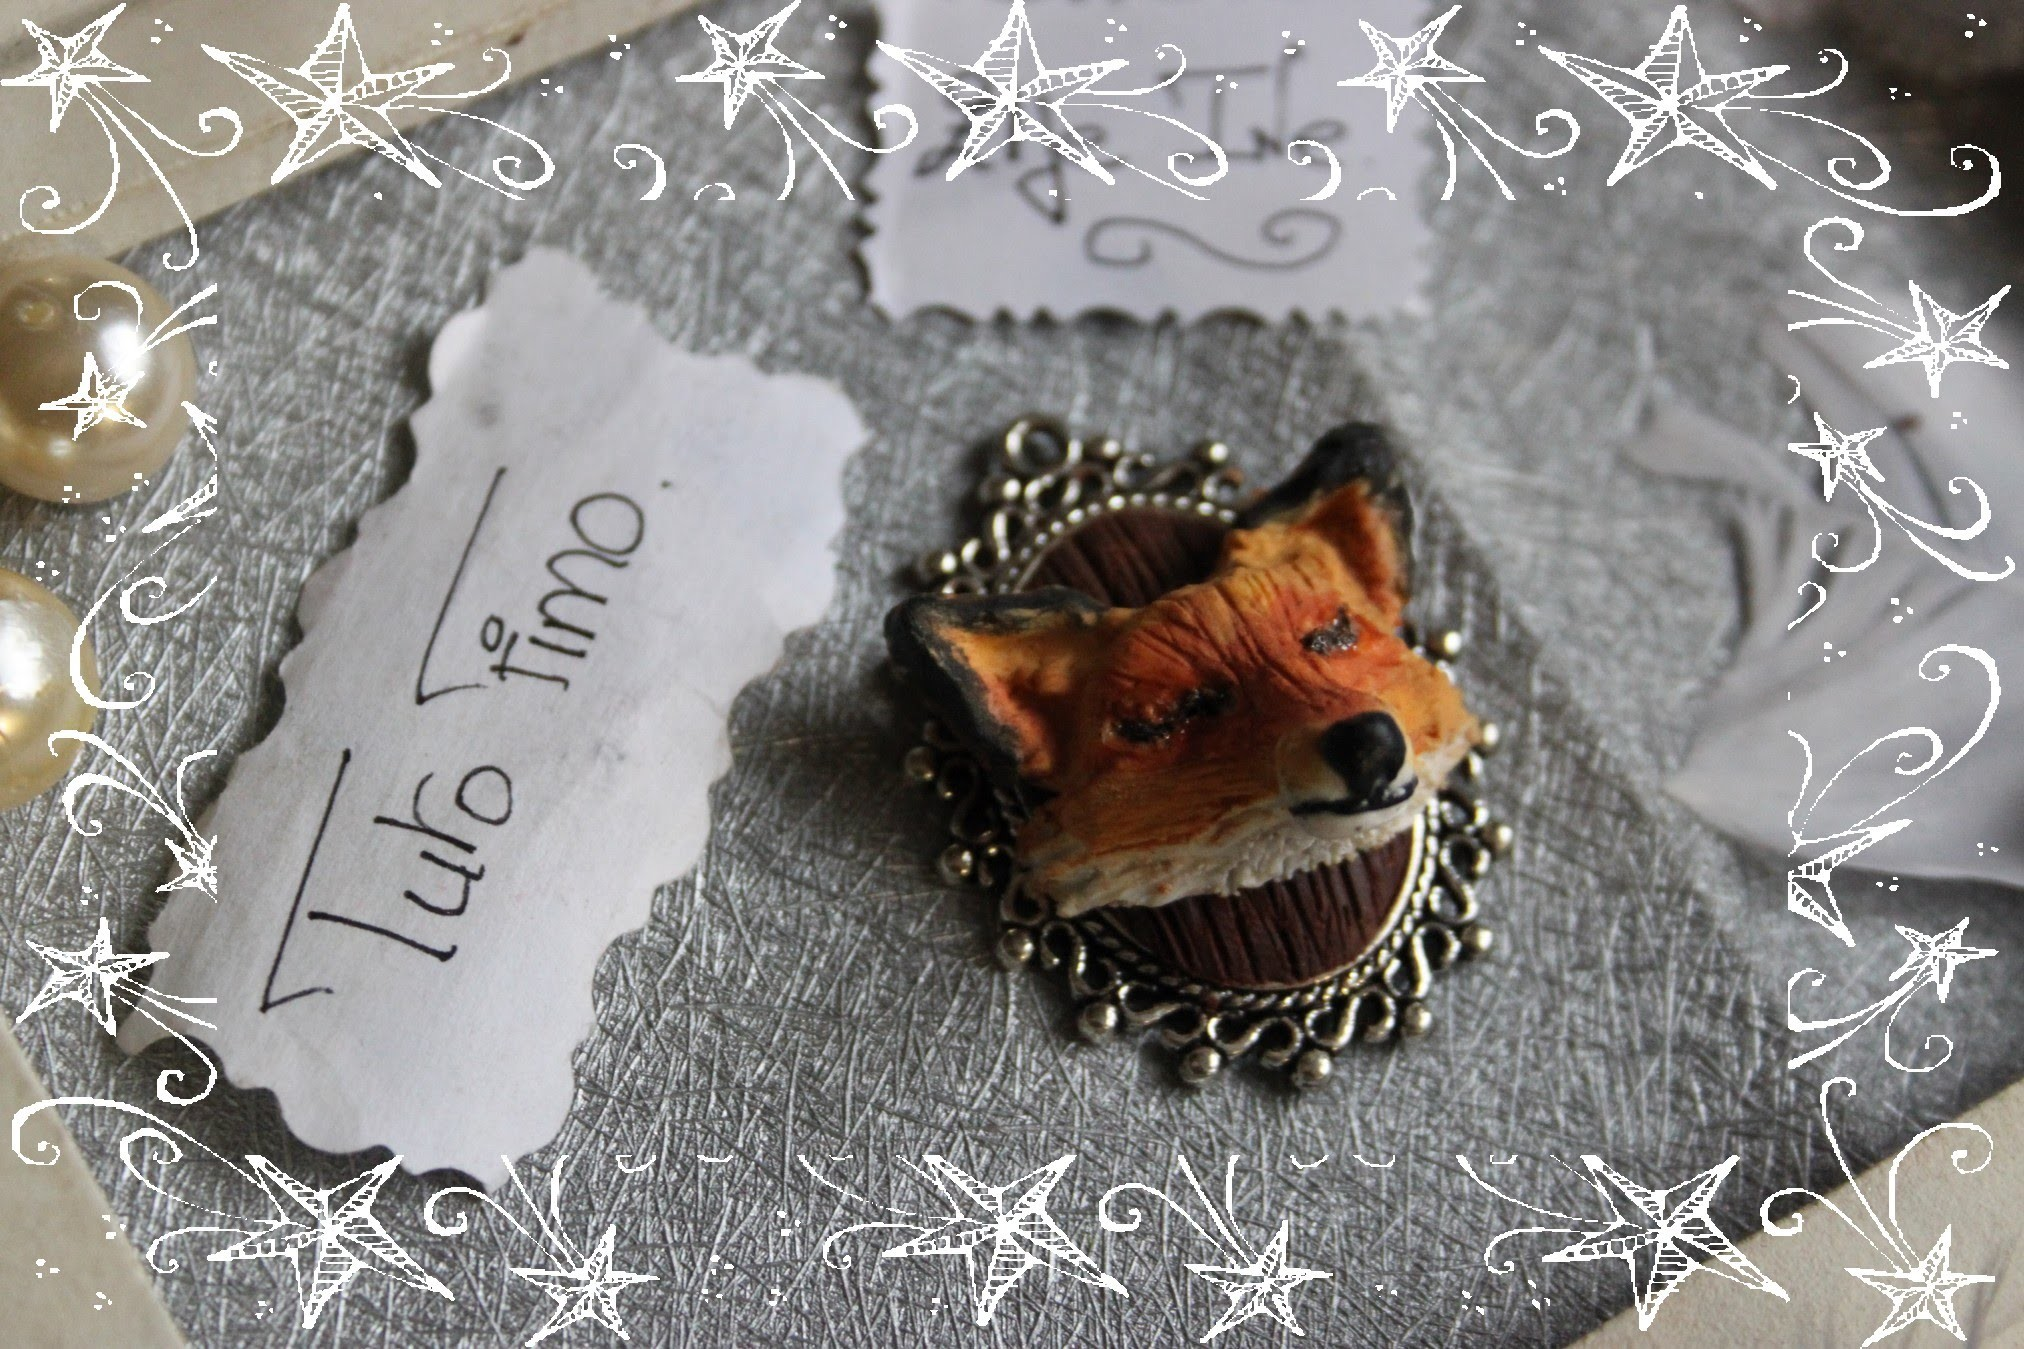 [♥✿ Tuto Fimo : Renard ✿♥] ~ [♥✿ Polymer Clay Tutorial : Fox ✿♥]